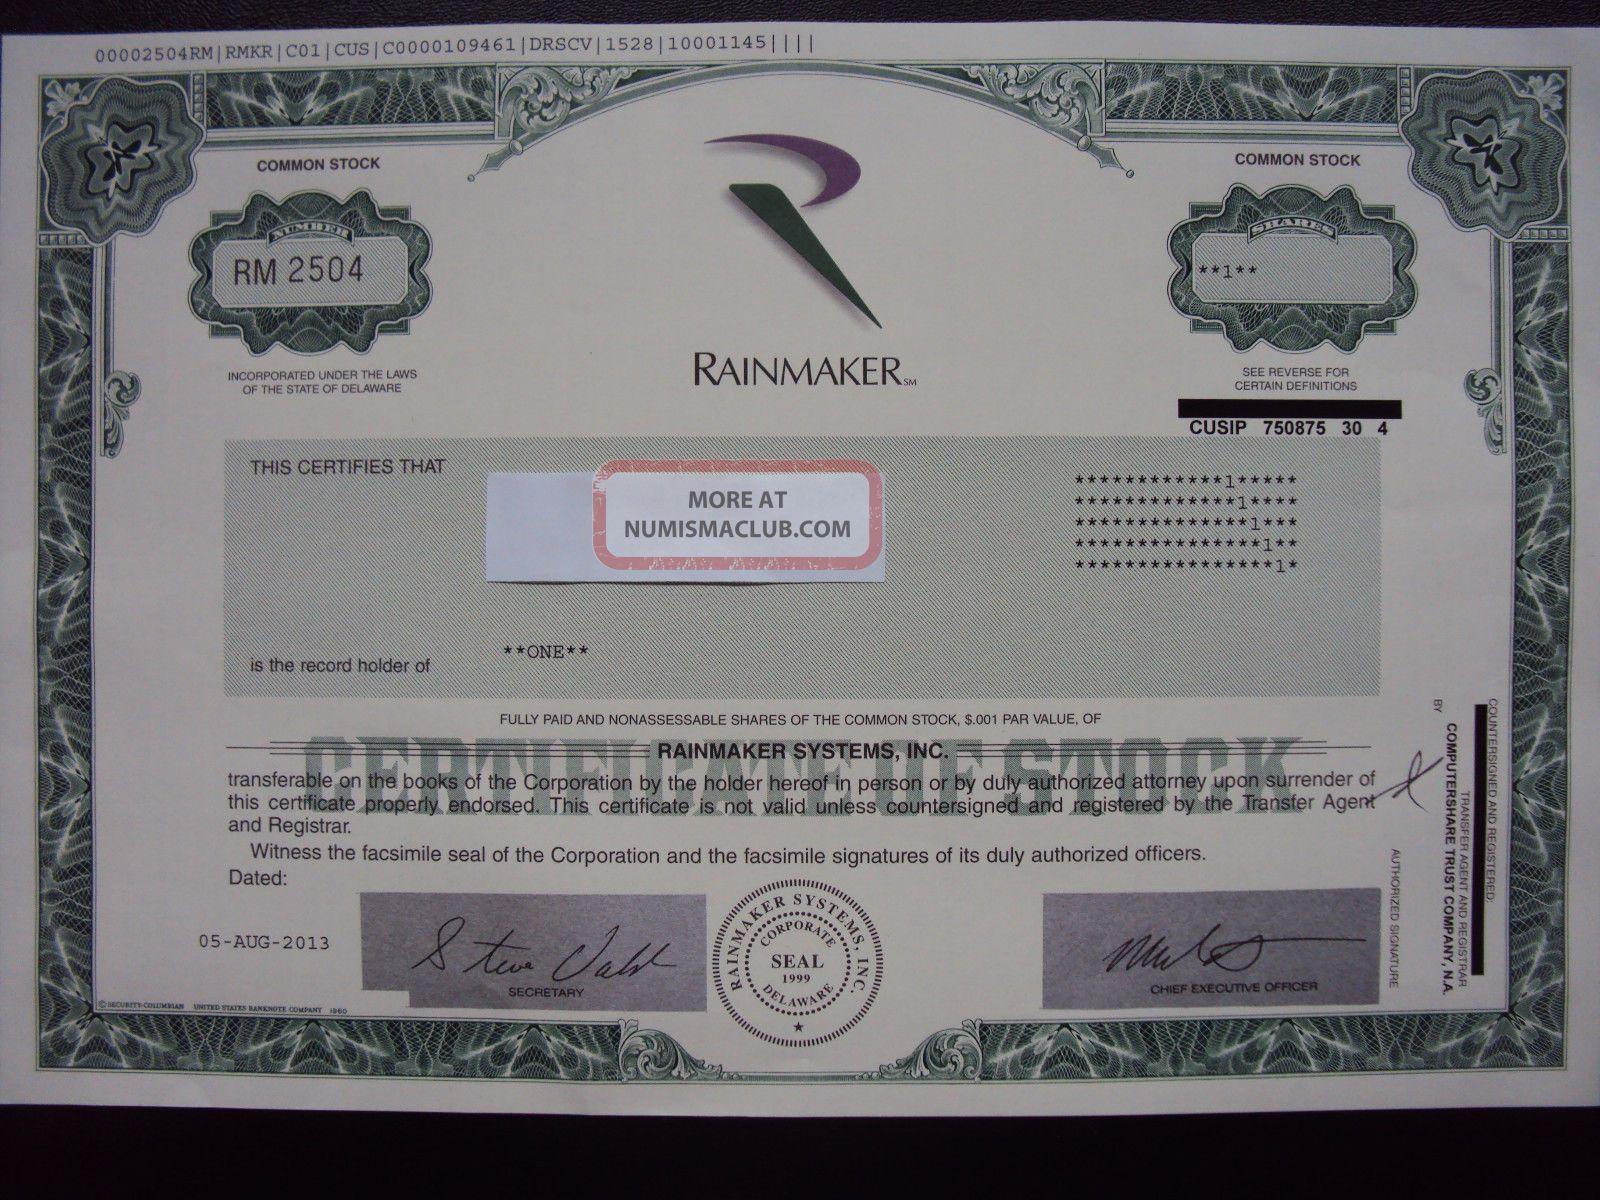 Rainmaker Systems Stock Certificate Stocks & Bonds, Scripophily photo